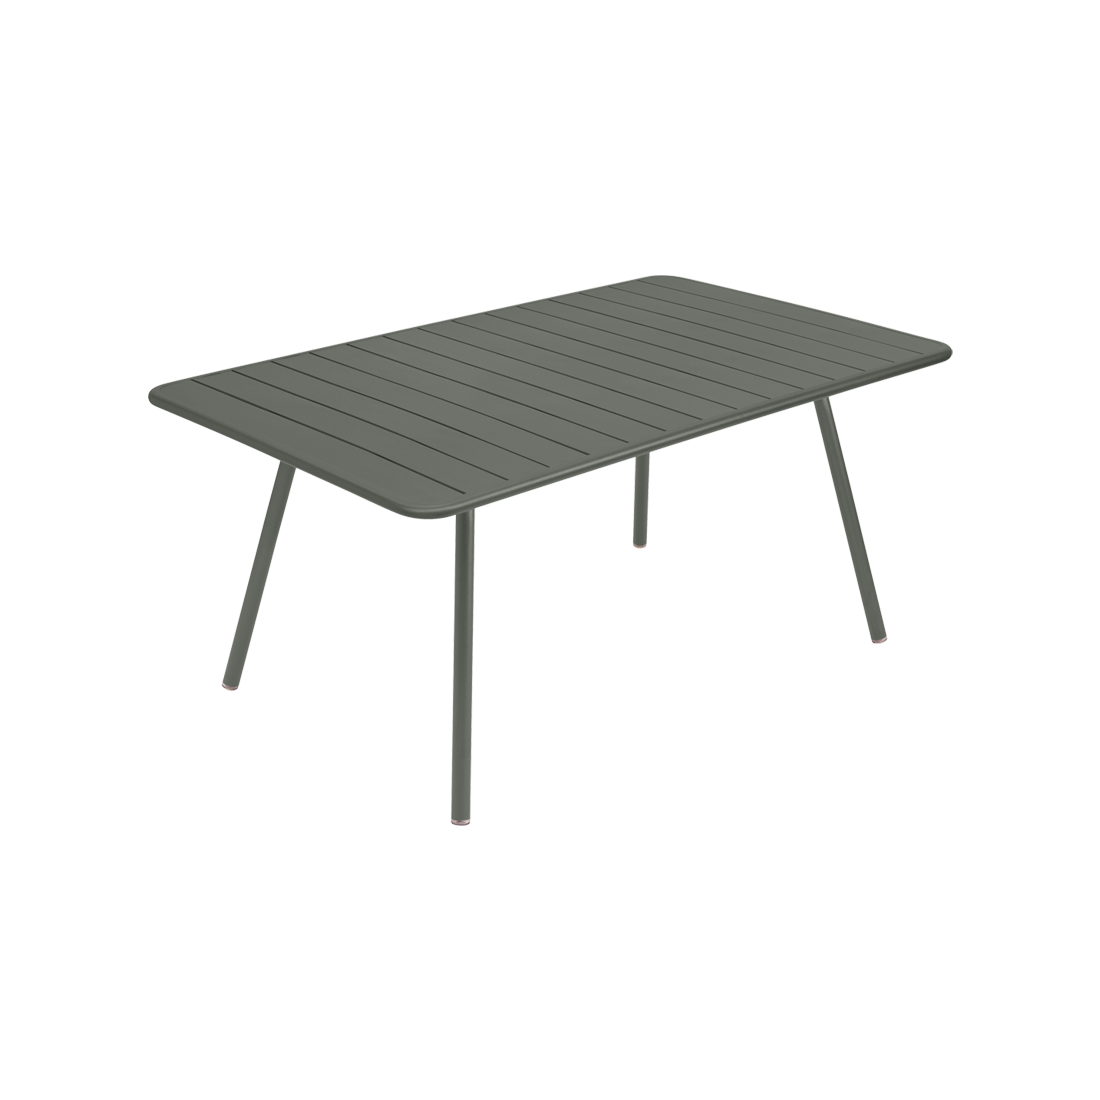 table 165x100 cm luxembourg table de jardin table jardin 8 personnes. Black Bedroom Furniture Sets. Home Design Ideas